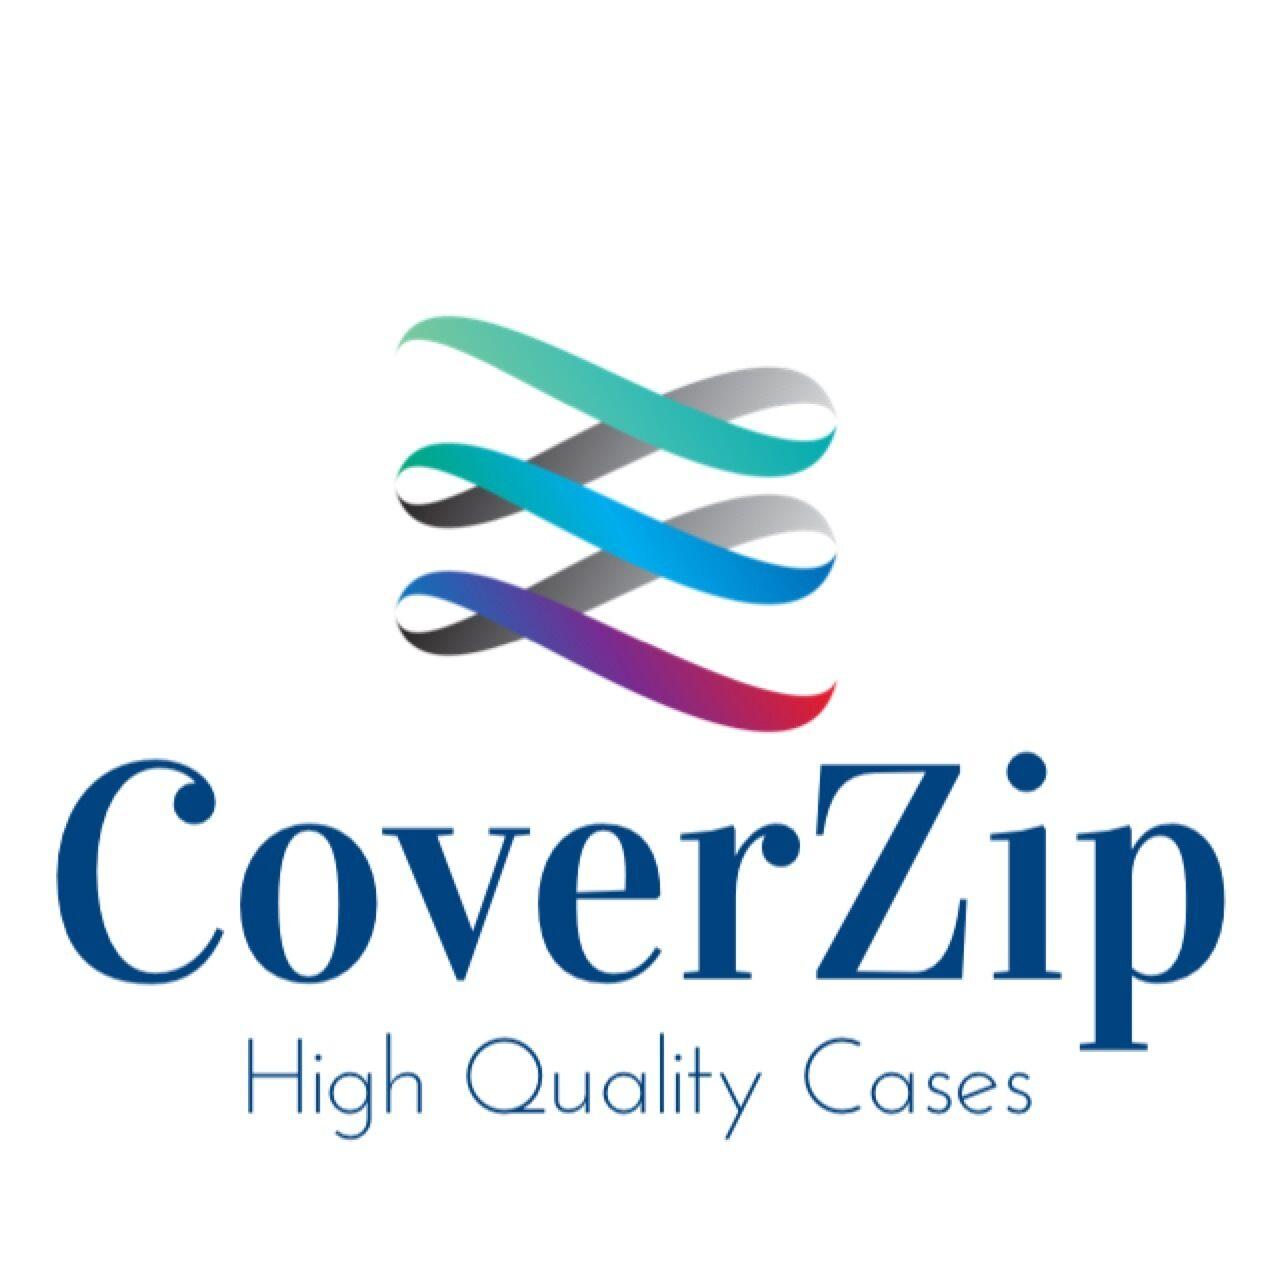 CoverZip